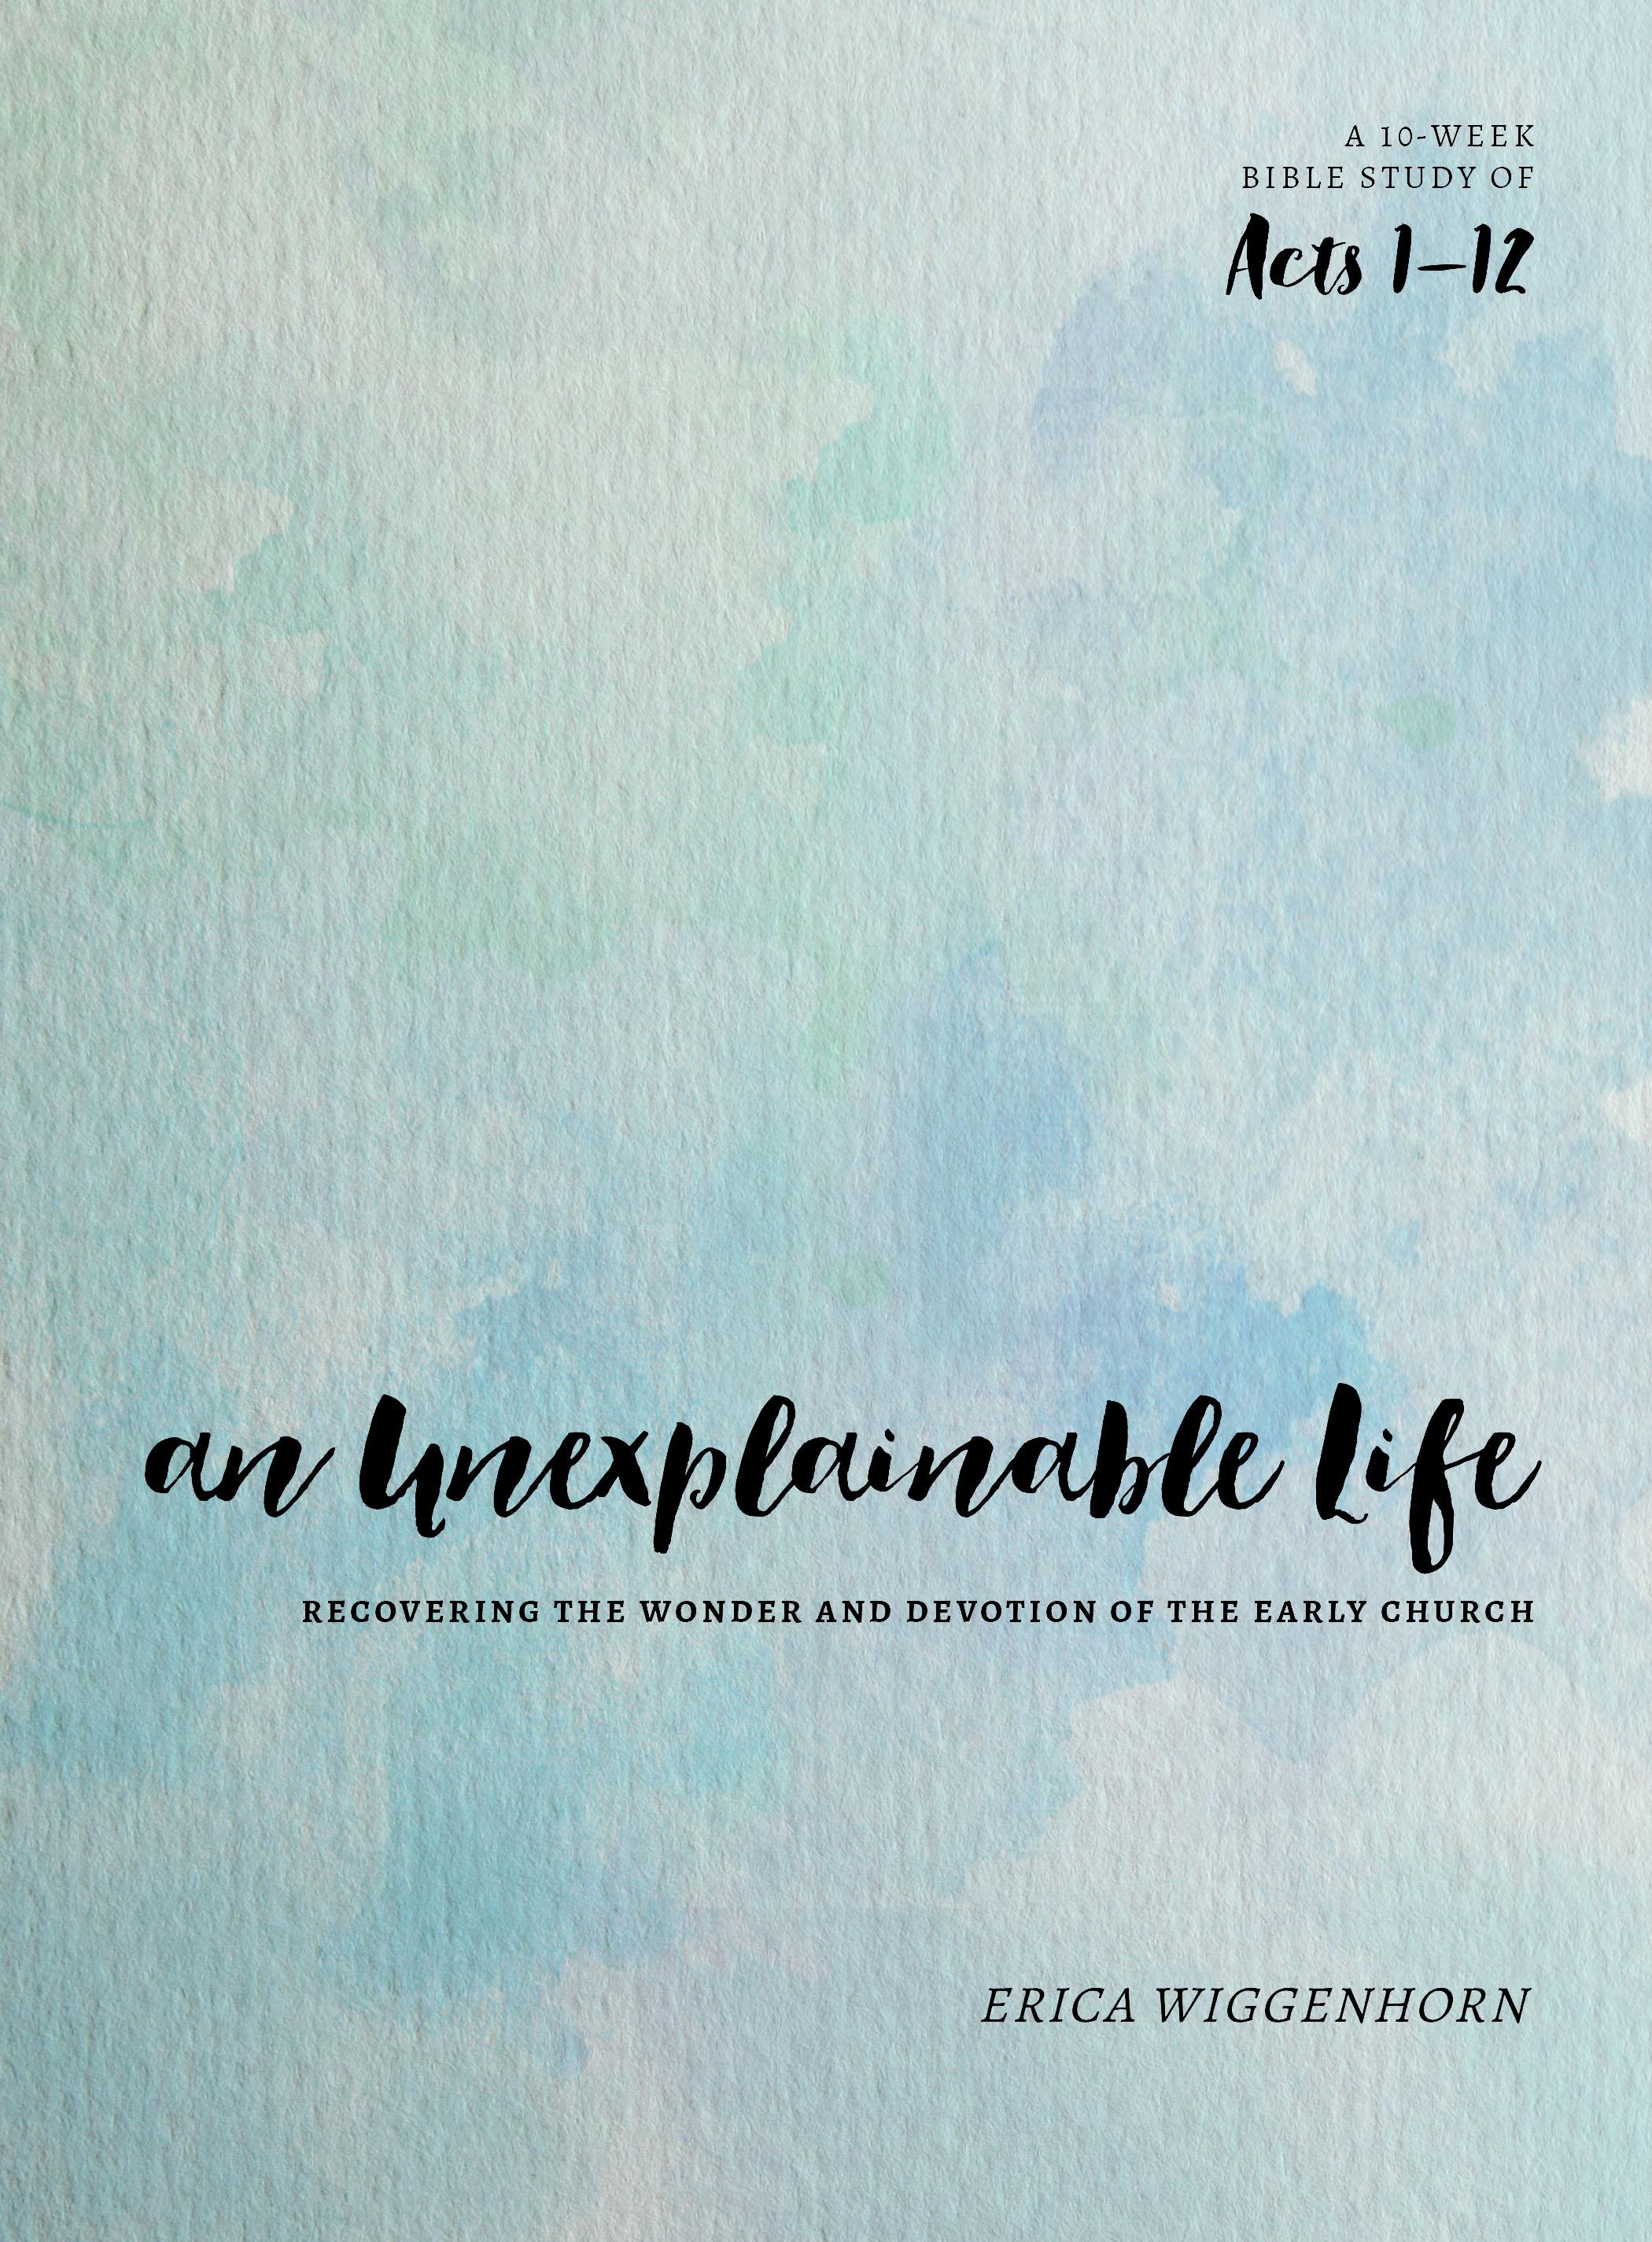 An unexplainable life book cover